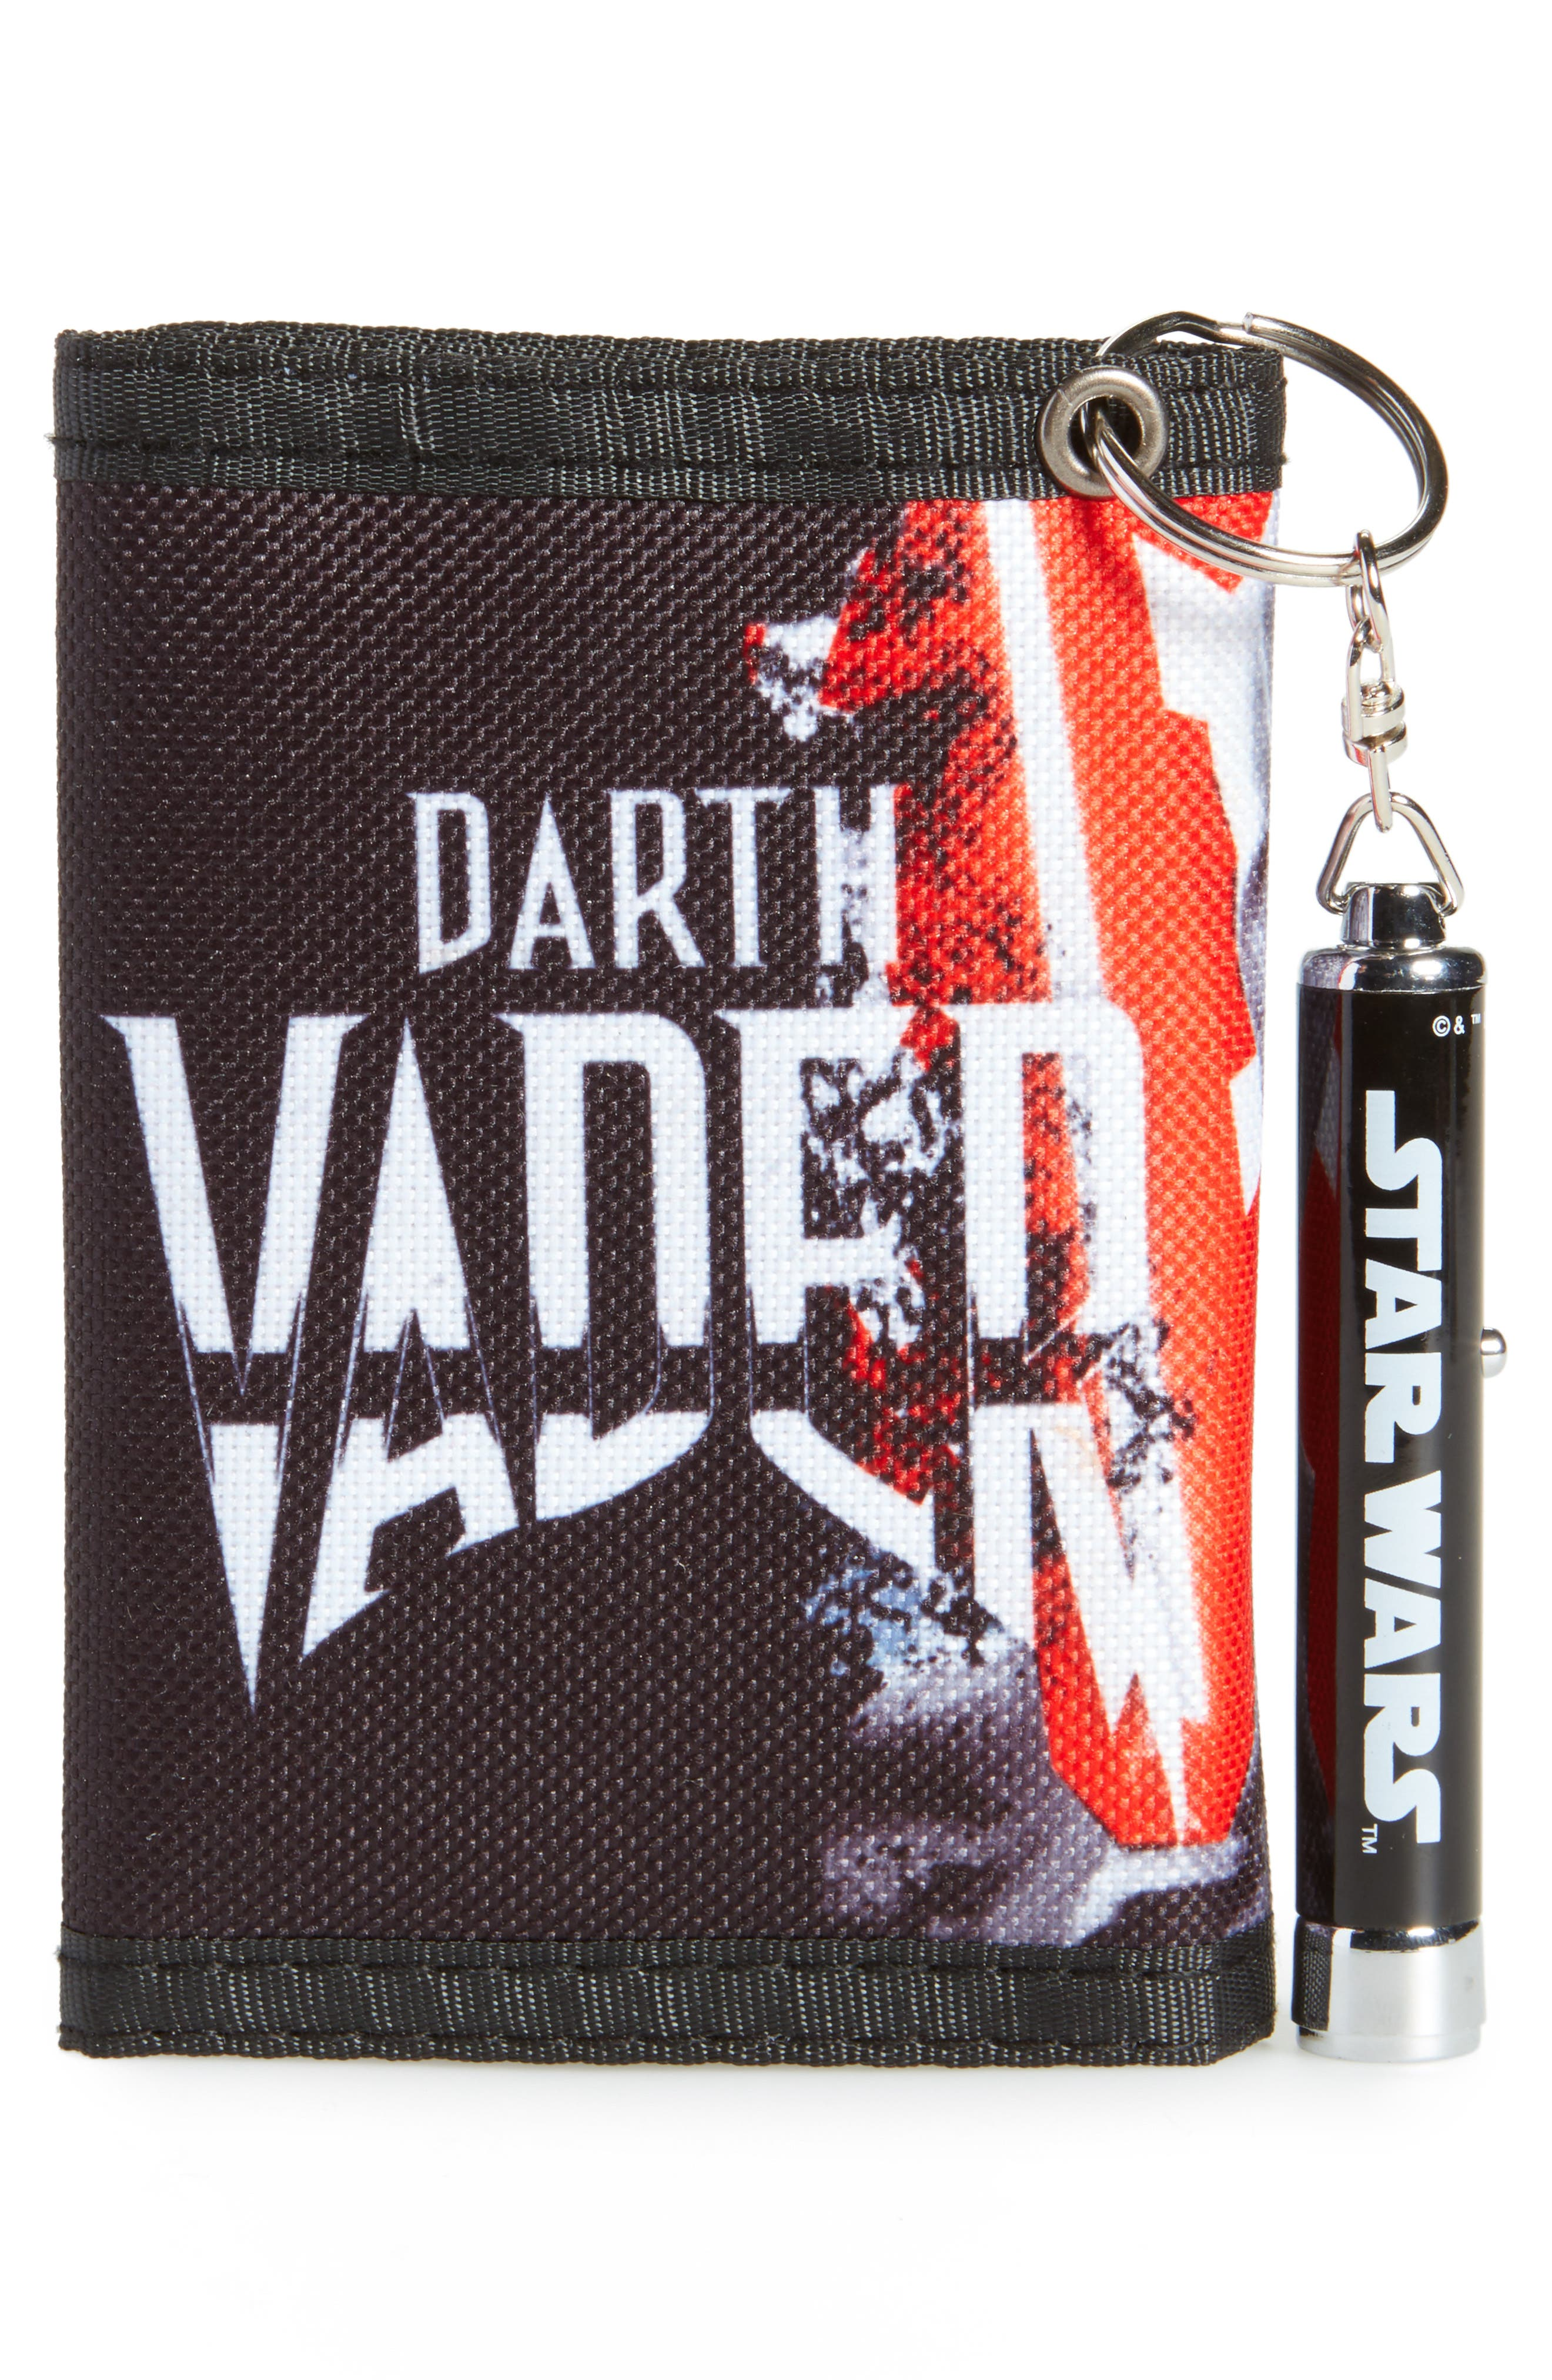 Darth Vader Wallet & Logo Light Key Chain,                             Alternate thumbnail 3, color,                             Black